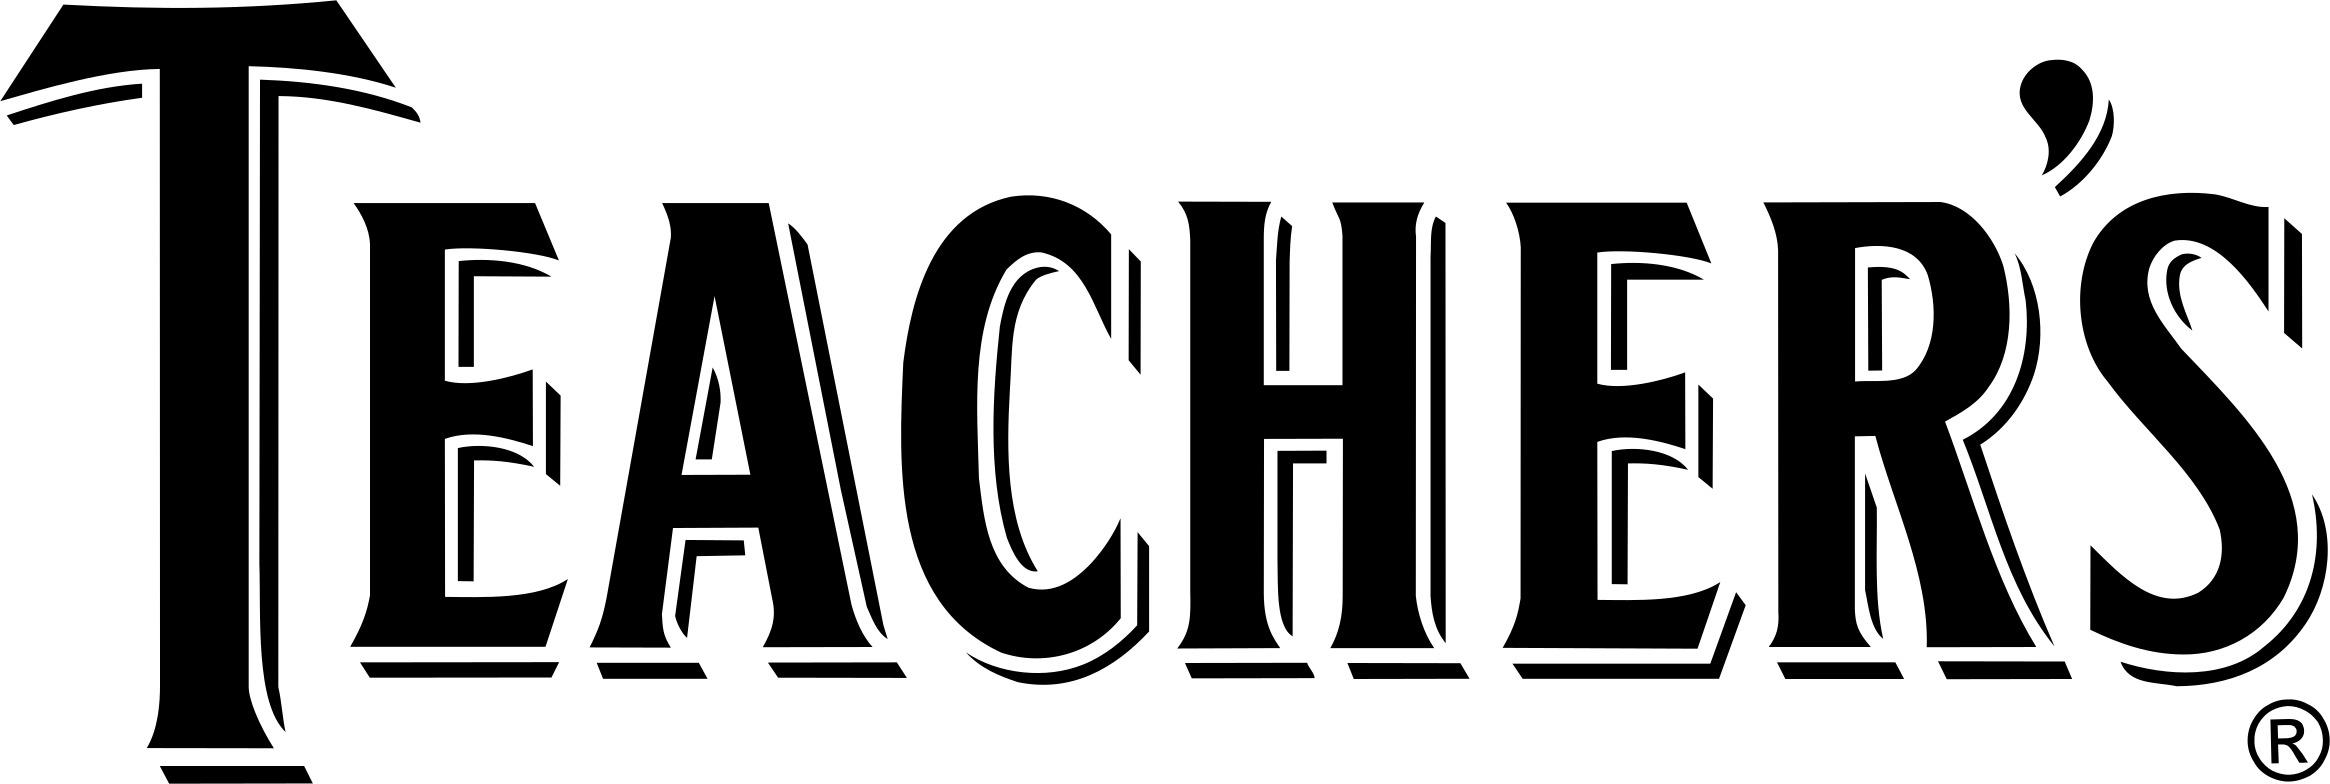 Teacher's logo